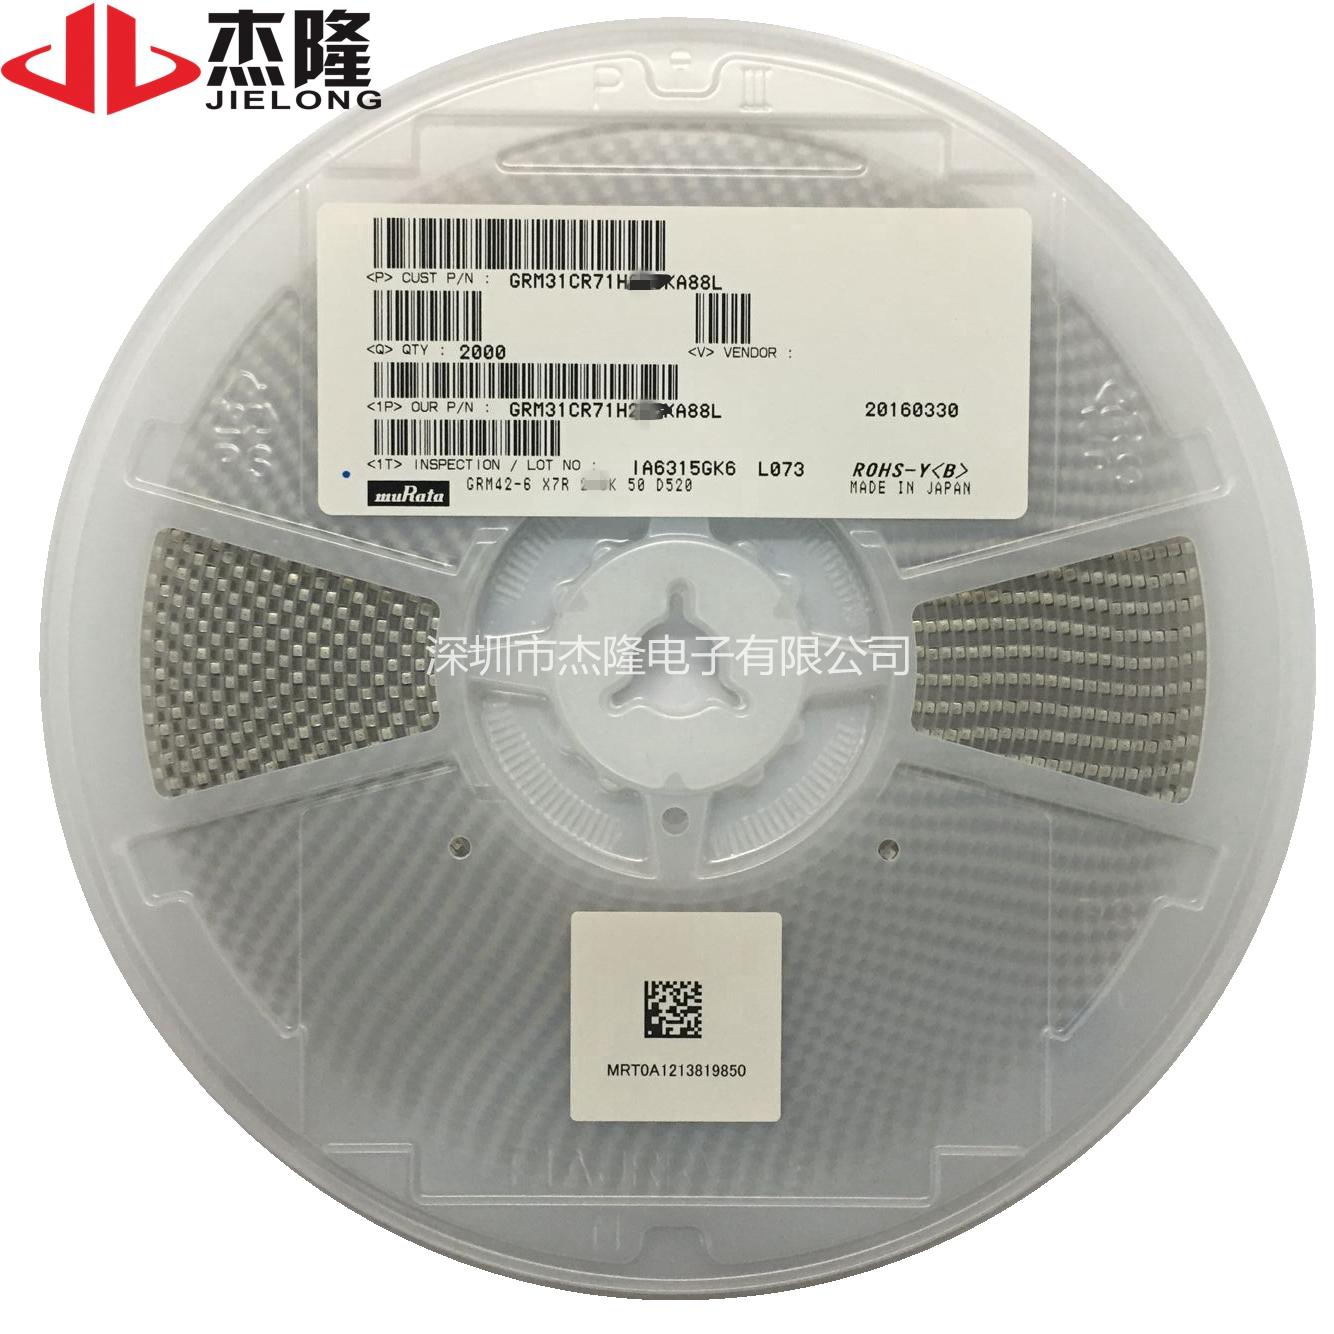 1206 344K 340NF 250V 10% 中高压陶瓷 3216 贴片电容(50只)